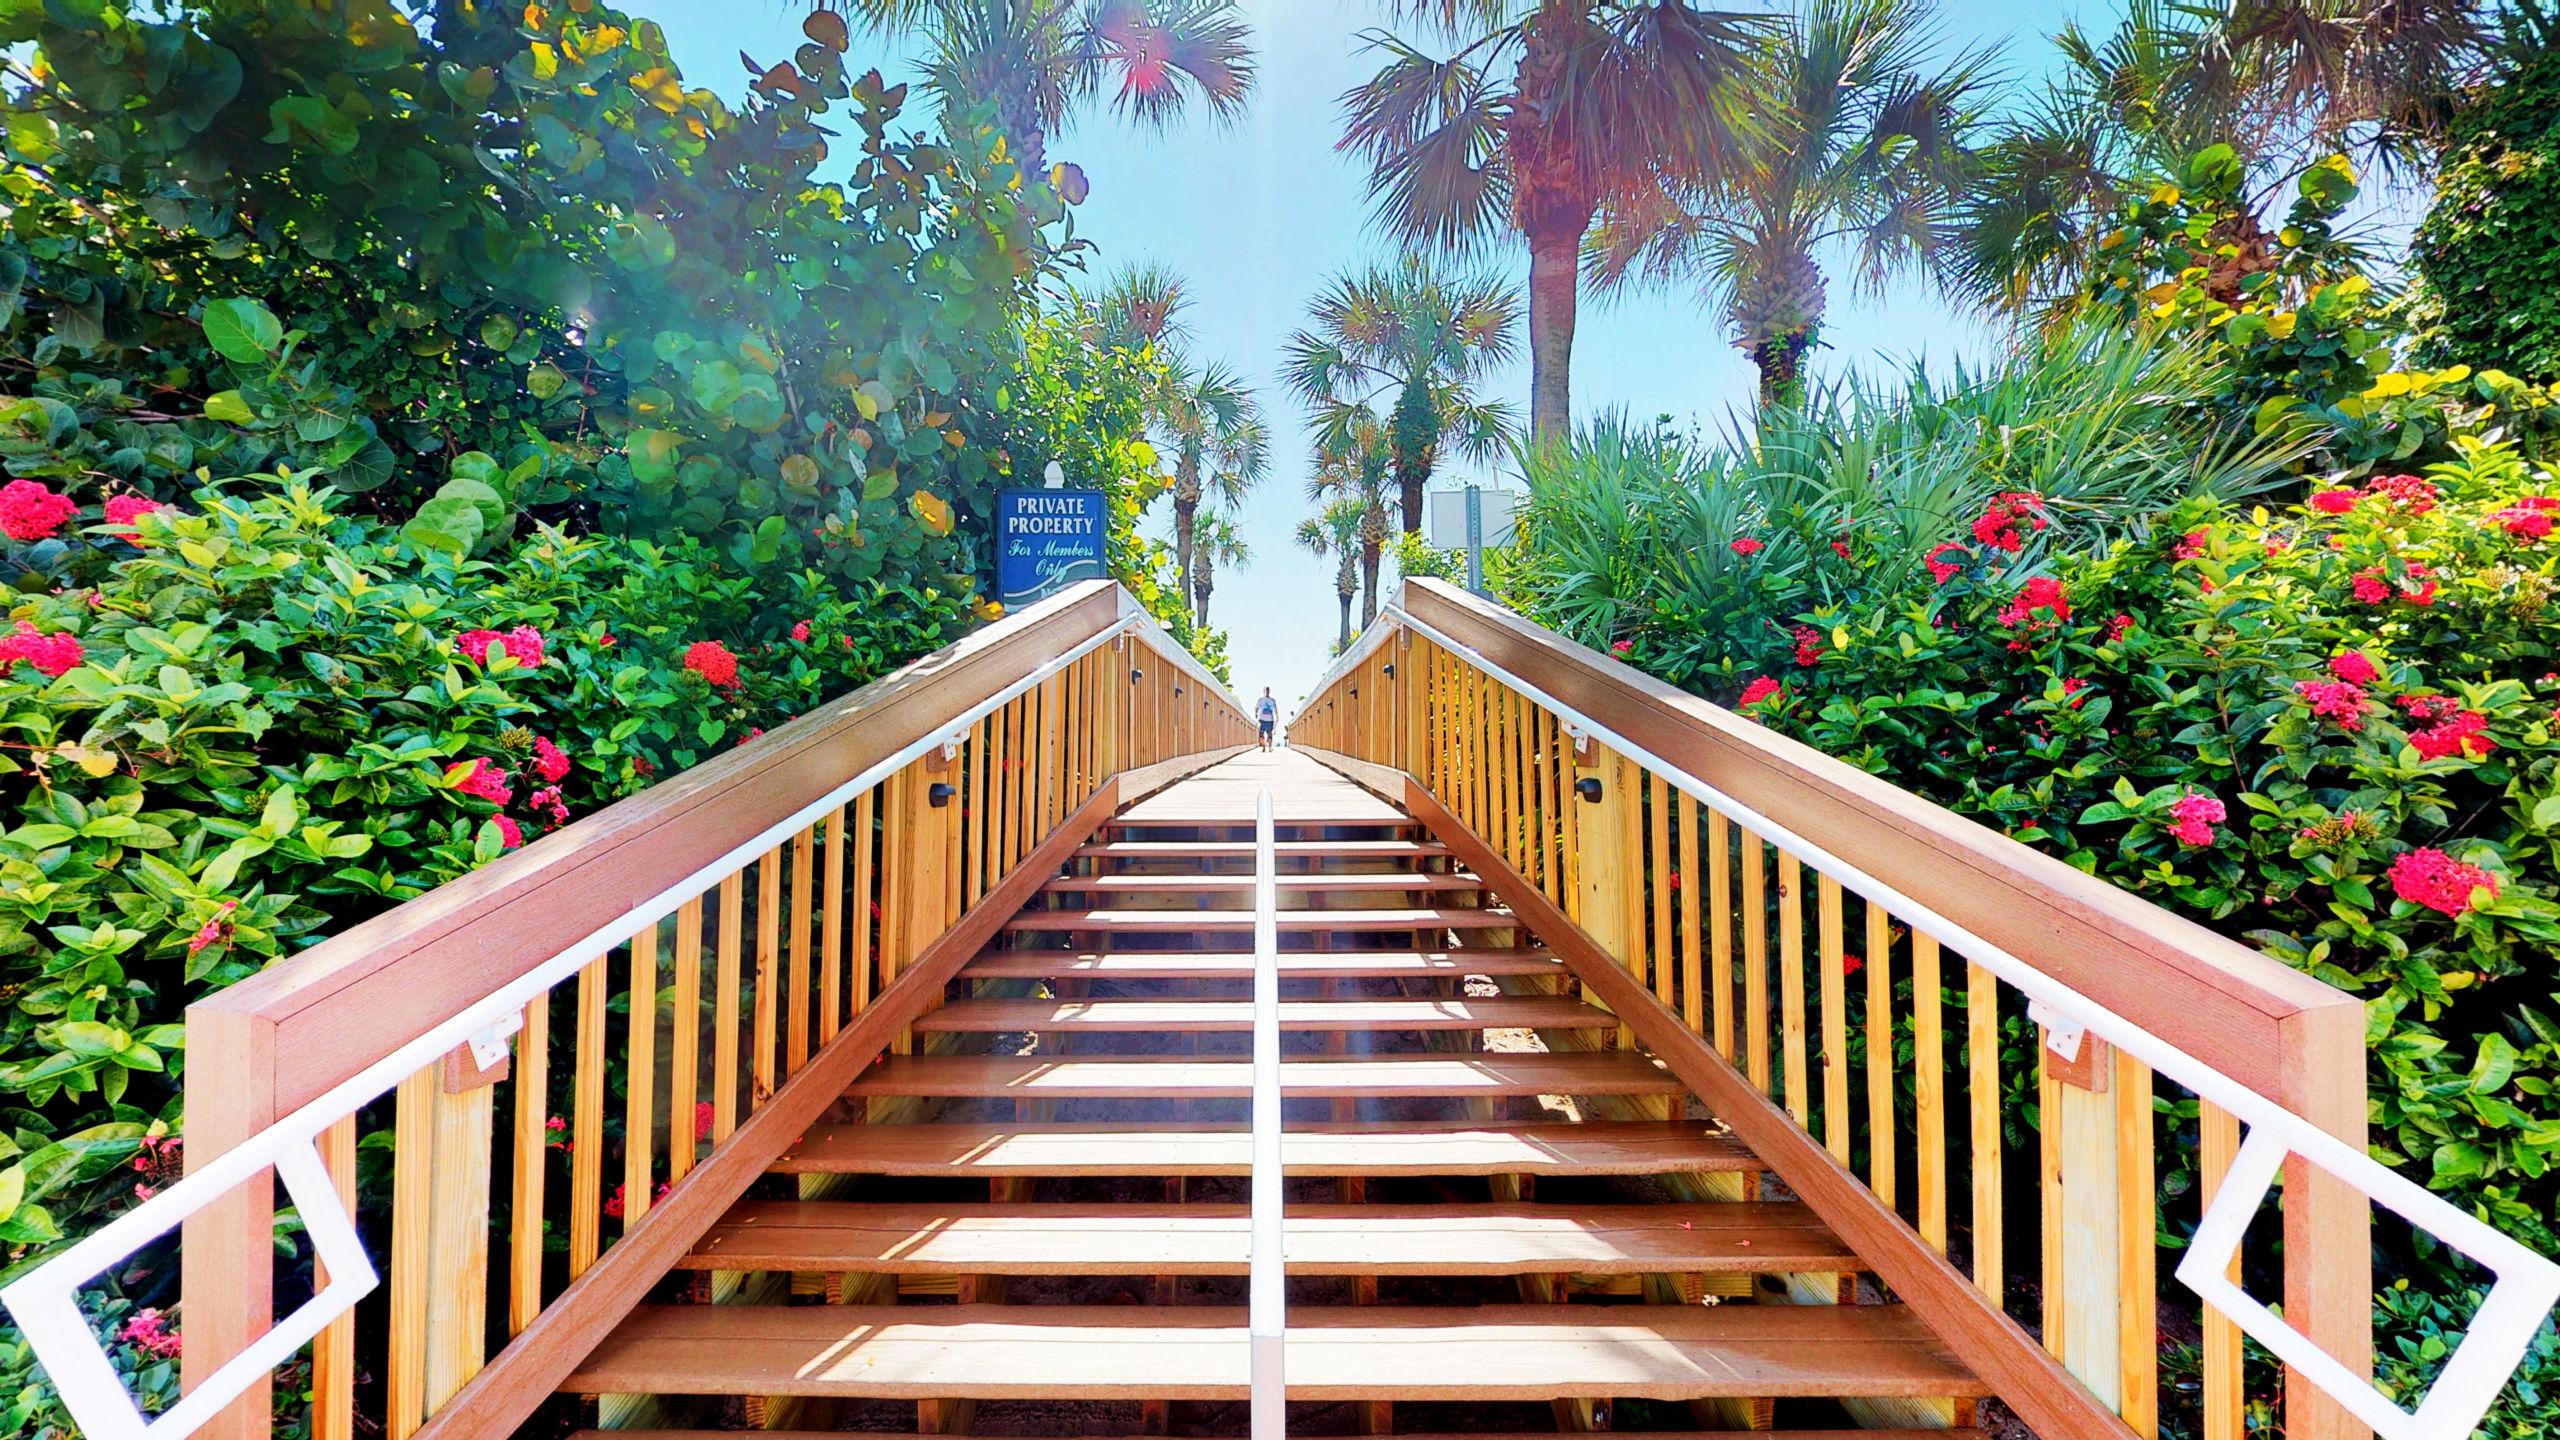 Follow me to the Beach!